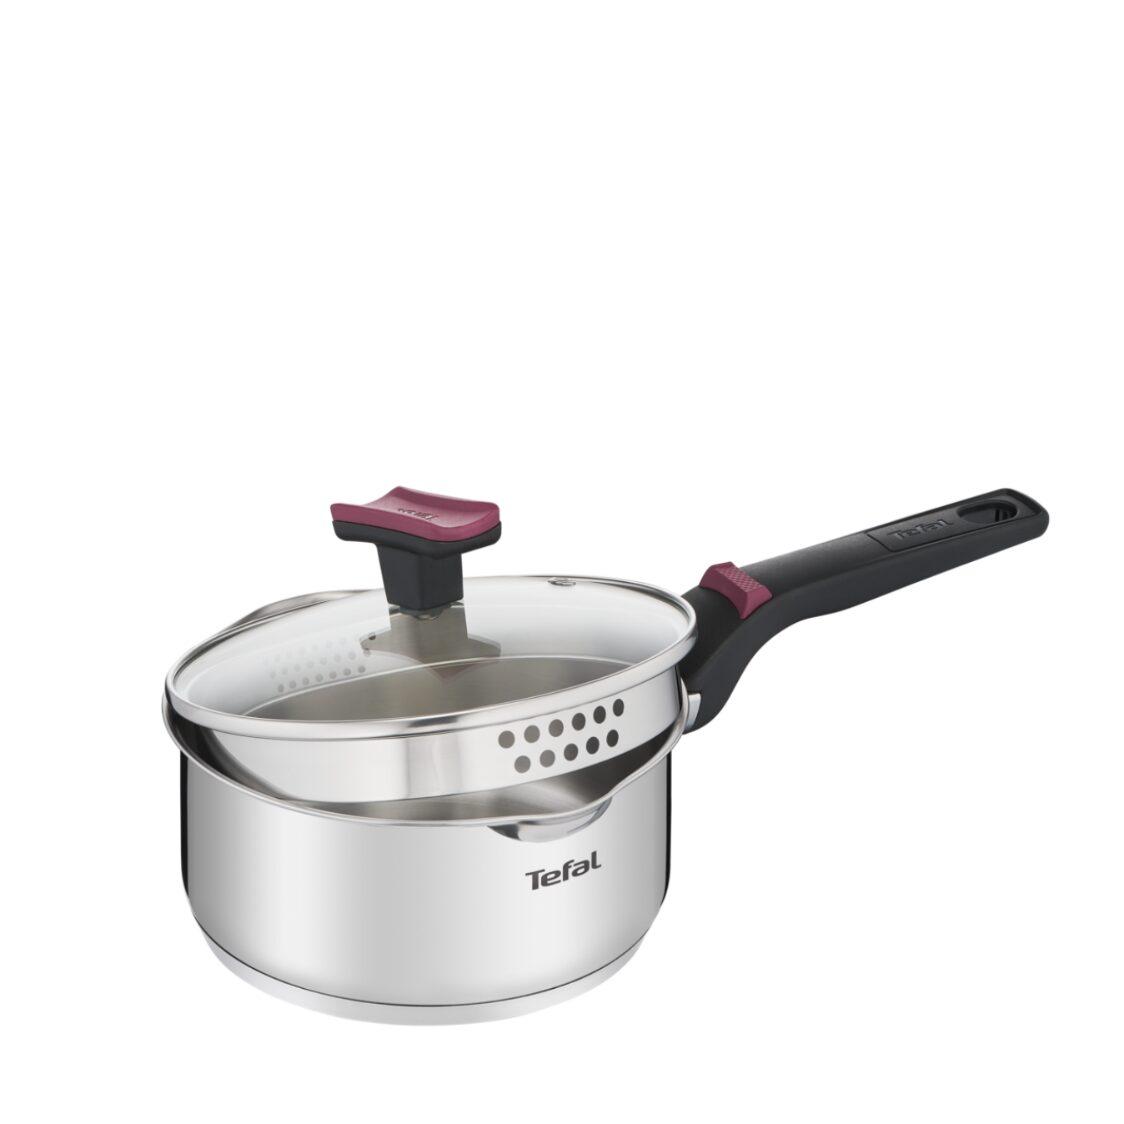 Tefal Cook  Clip Saucepan 18cm  Lid G72323